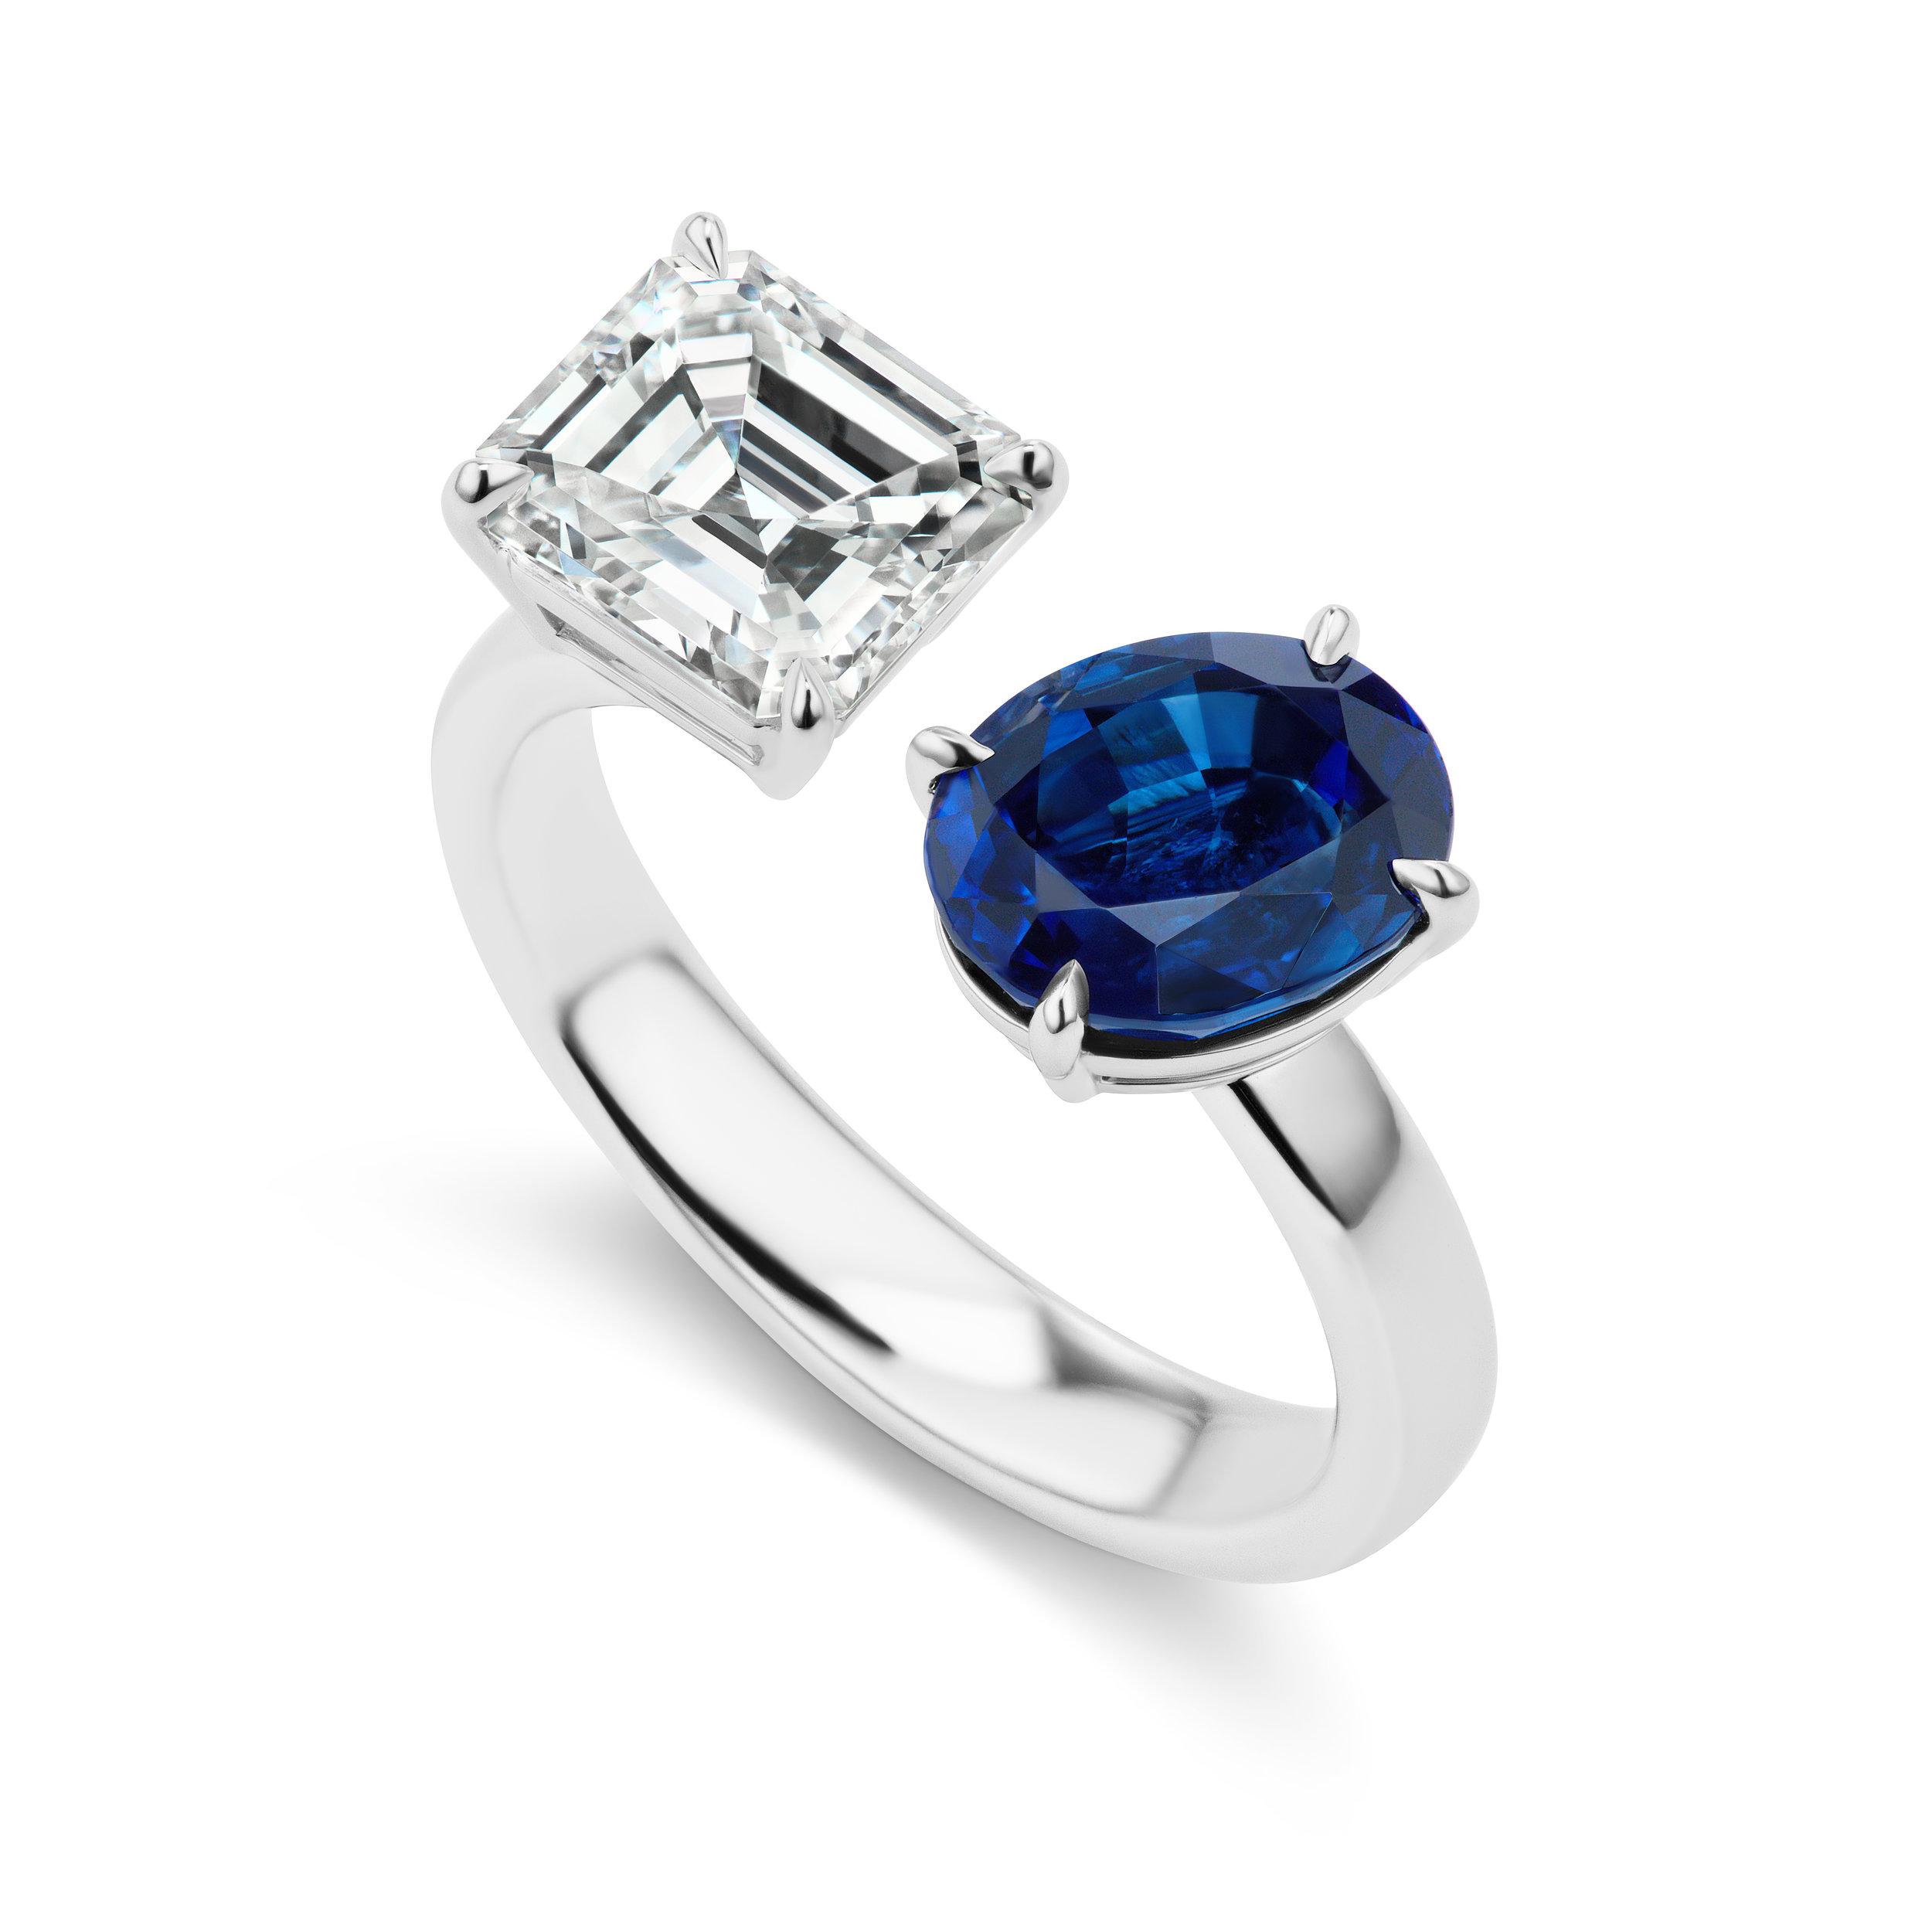 Asscher cut diamond and sapphire open ring, mounted in platinum.